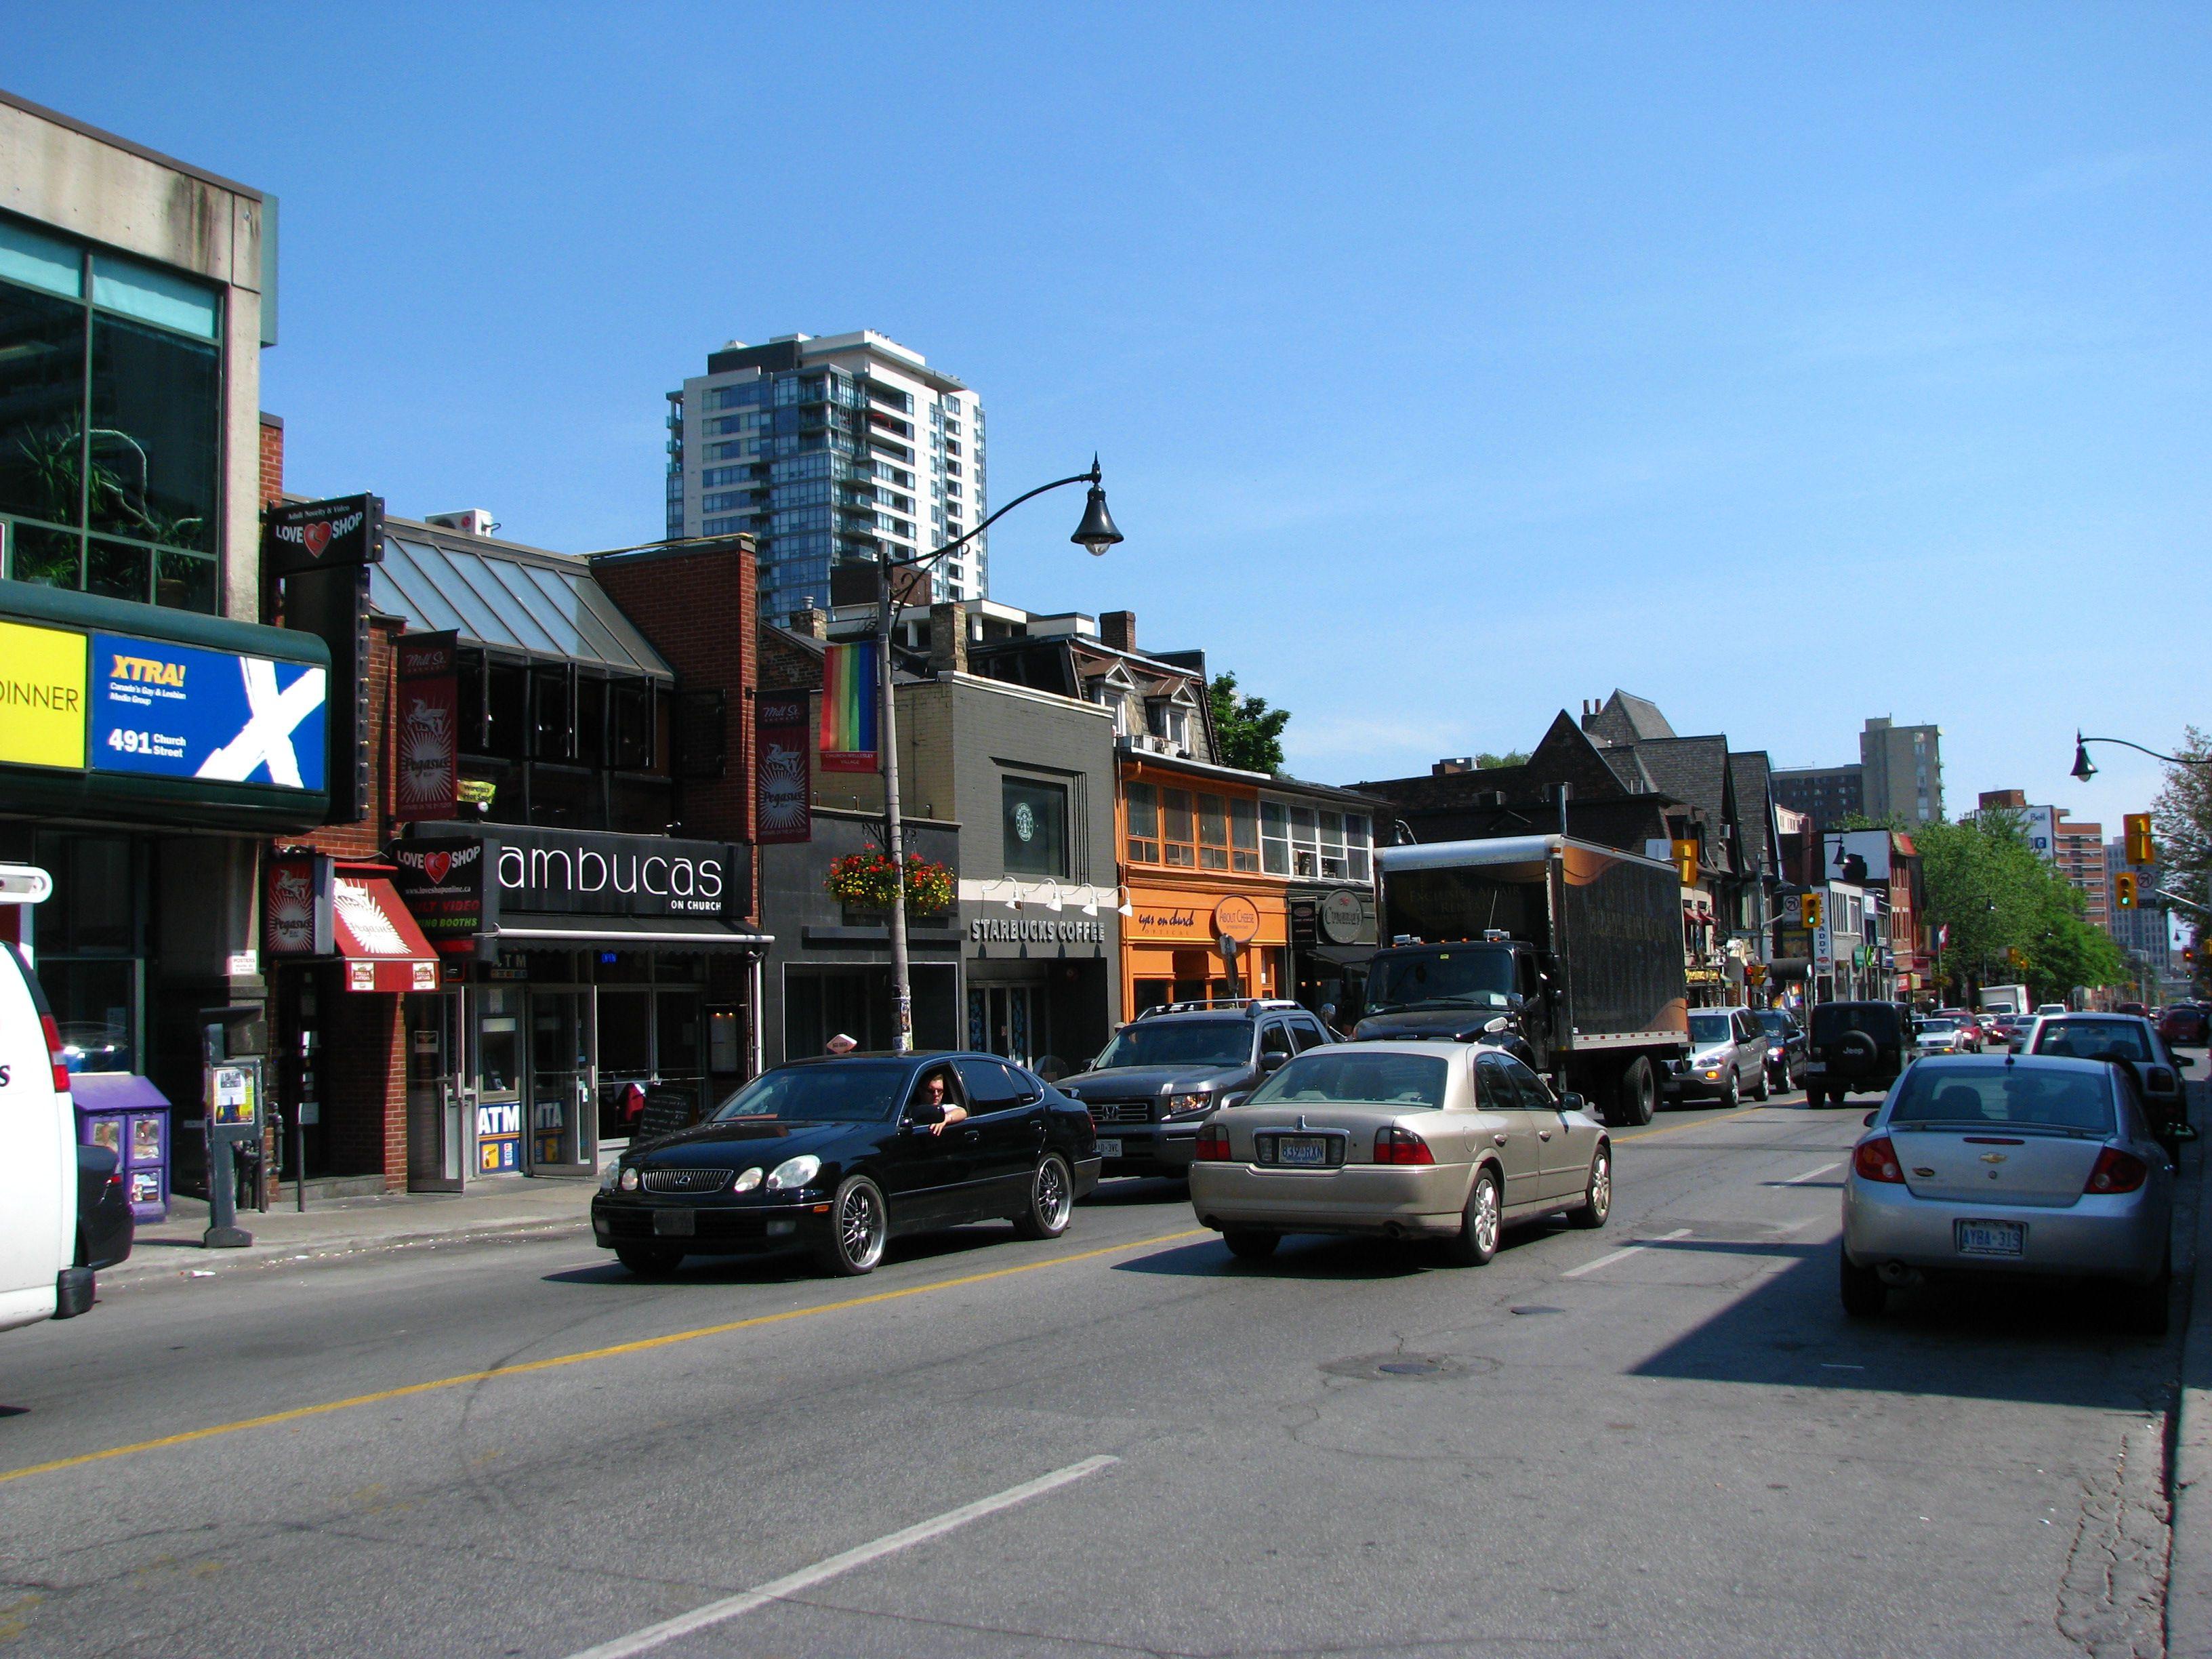 Toronto Gay Guideop Attractions in Toronto, Canada